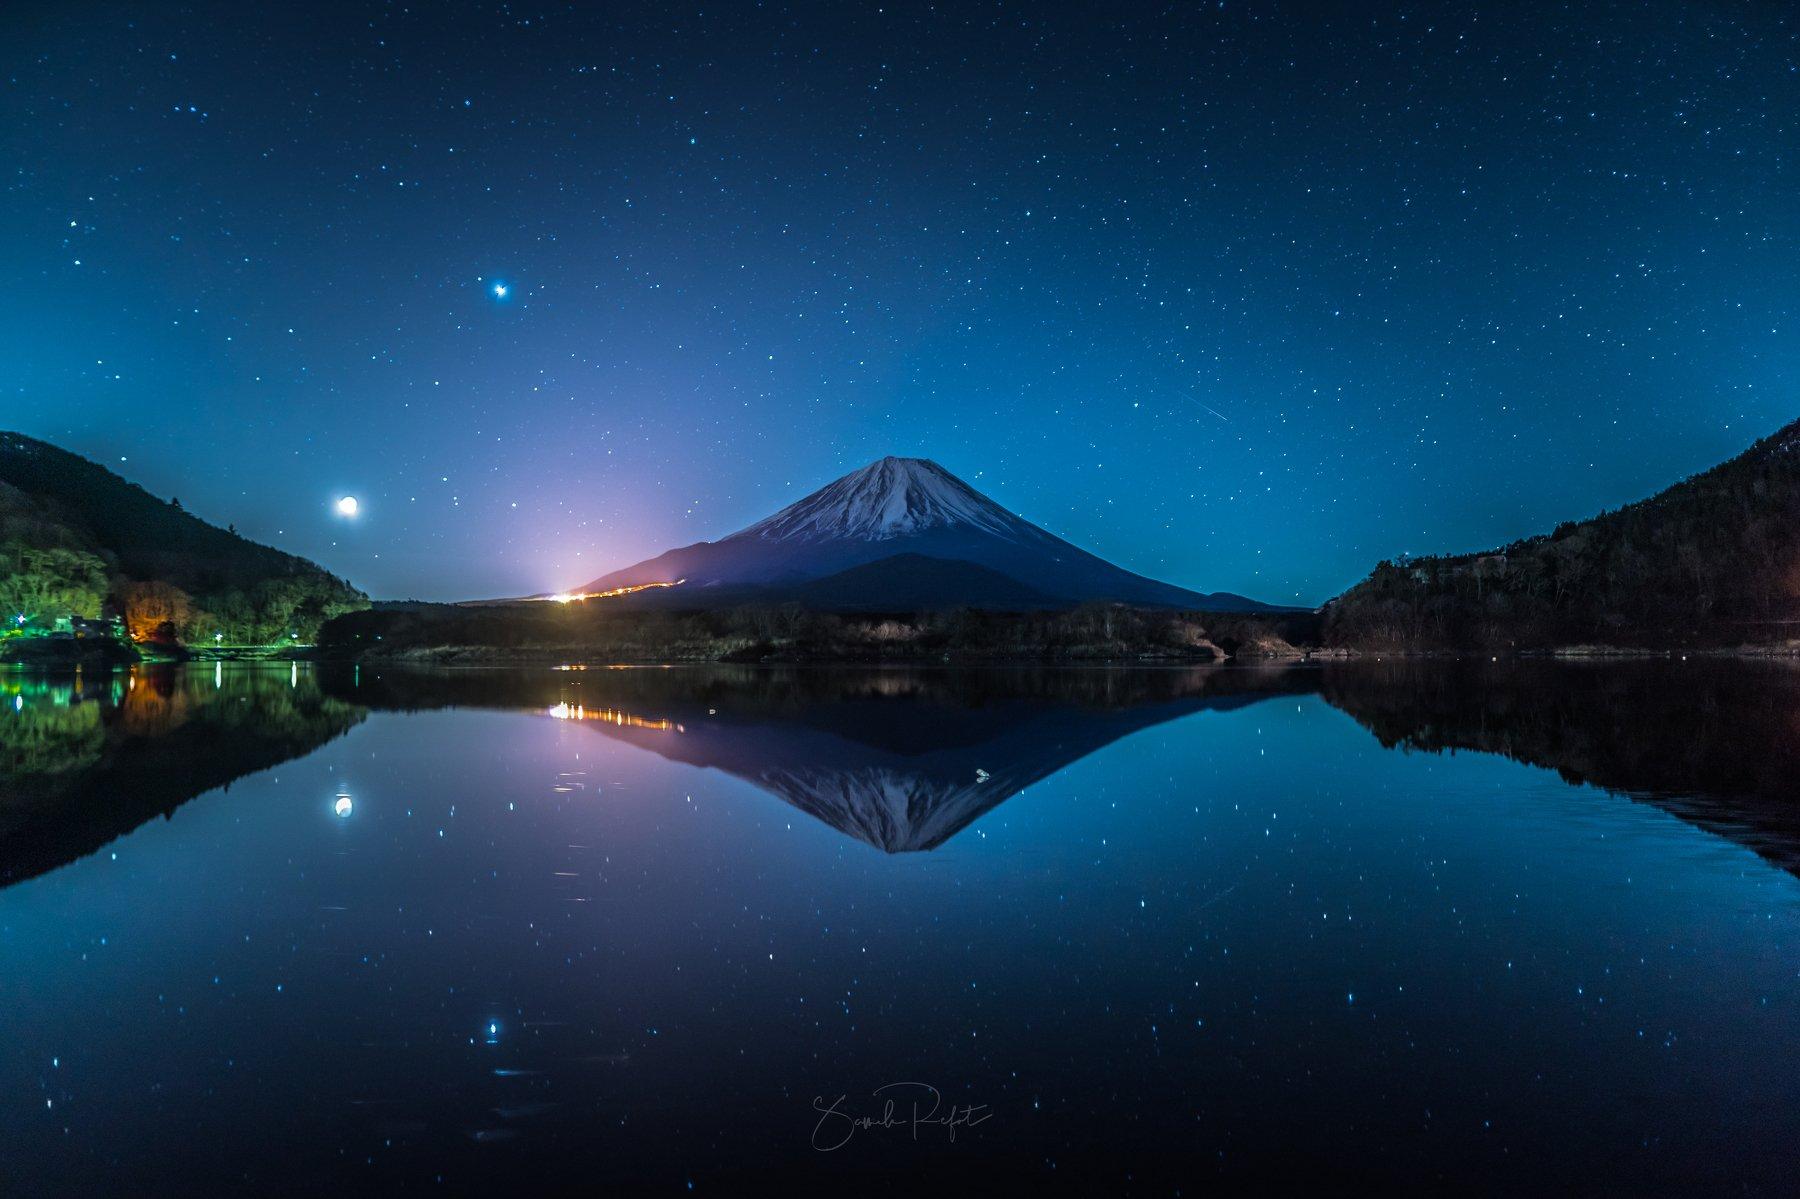 star, fuji, mountain, night,, Refat Sameh